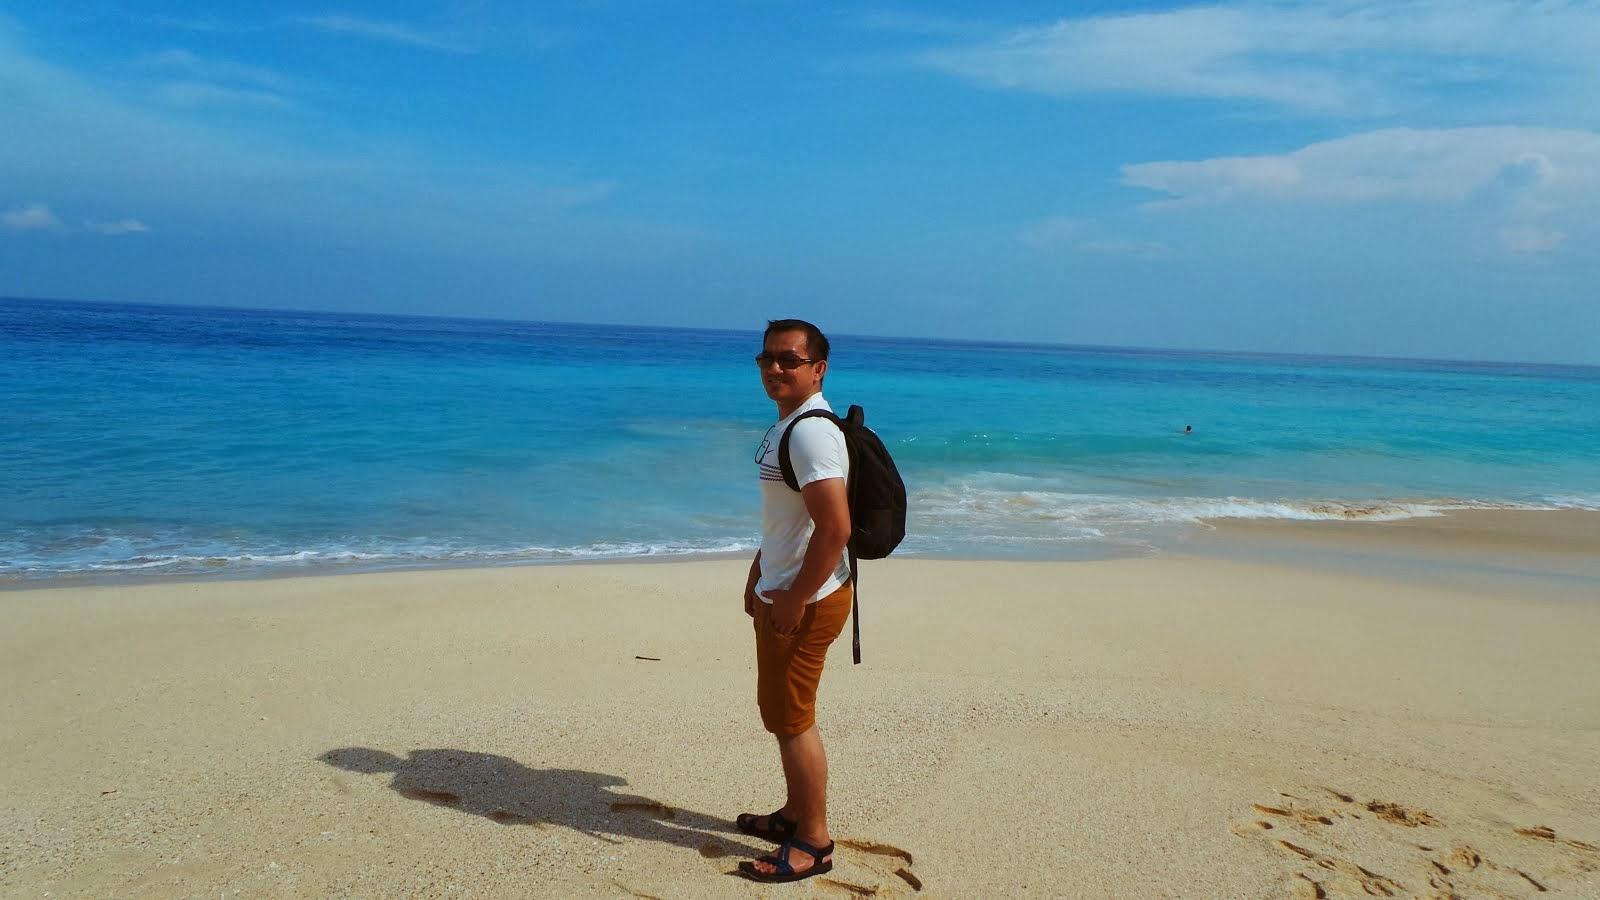 Dreamland Beach, Bali Indonesia